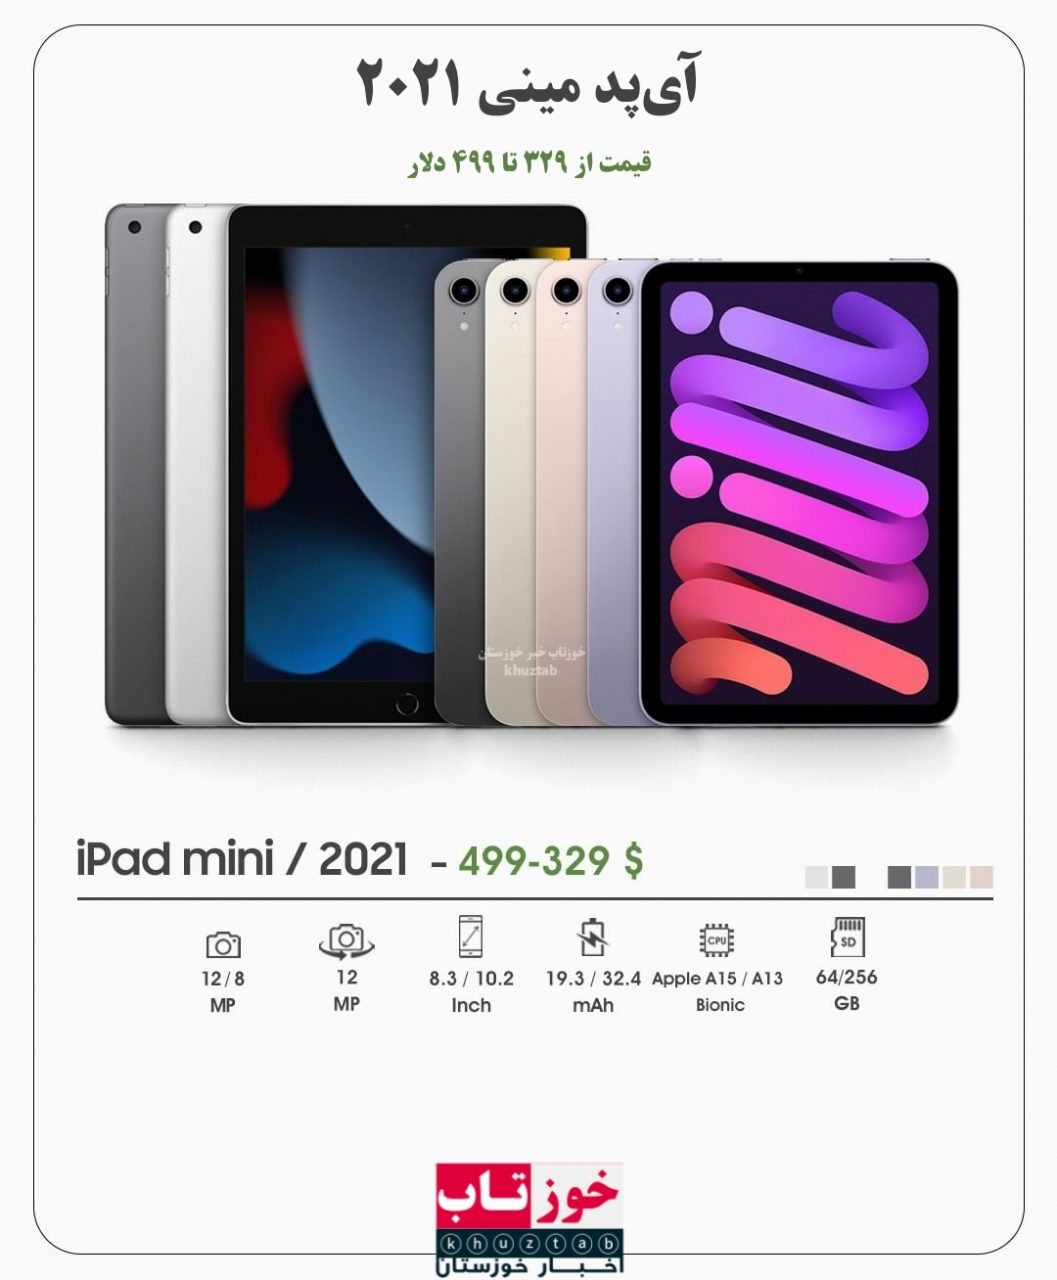 PicsArt 09 15 07.35.29 1057x1280 محصولات جدید اپل رونمایی شد/ از آیفون های سری ۱۳ تا آیپد مینی و اپلواچ سری ۷